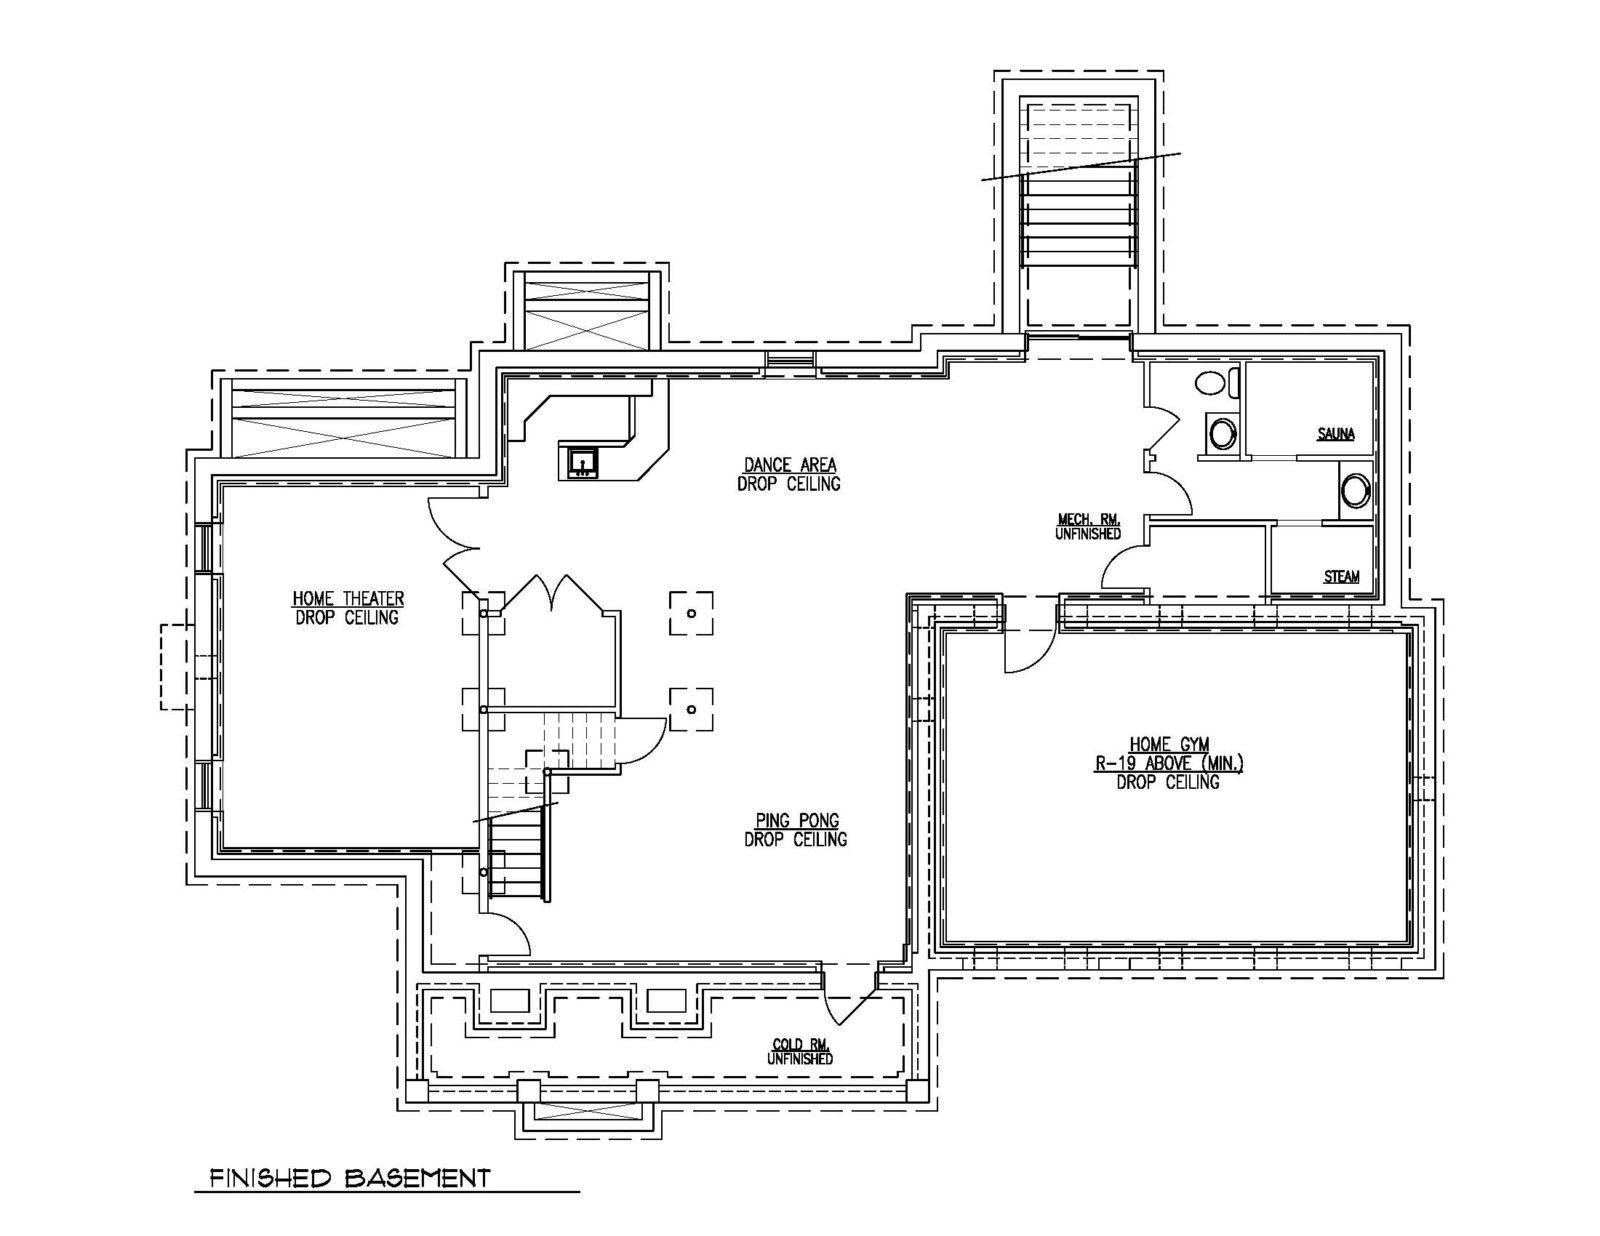 131-Barchester-Finished-Basement-Plan